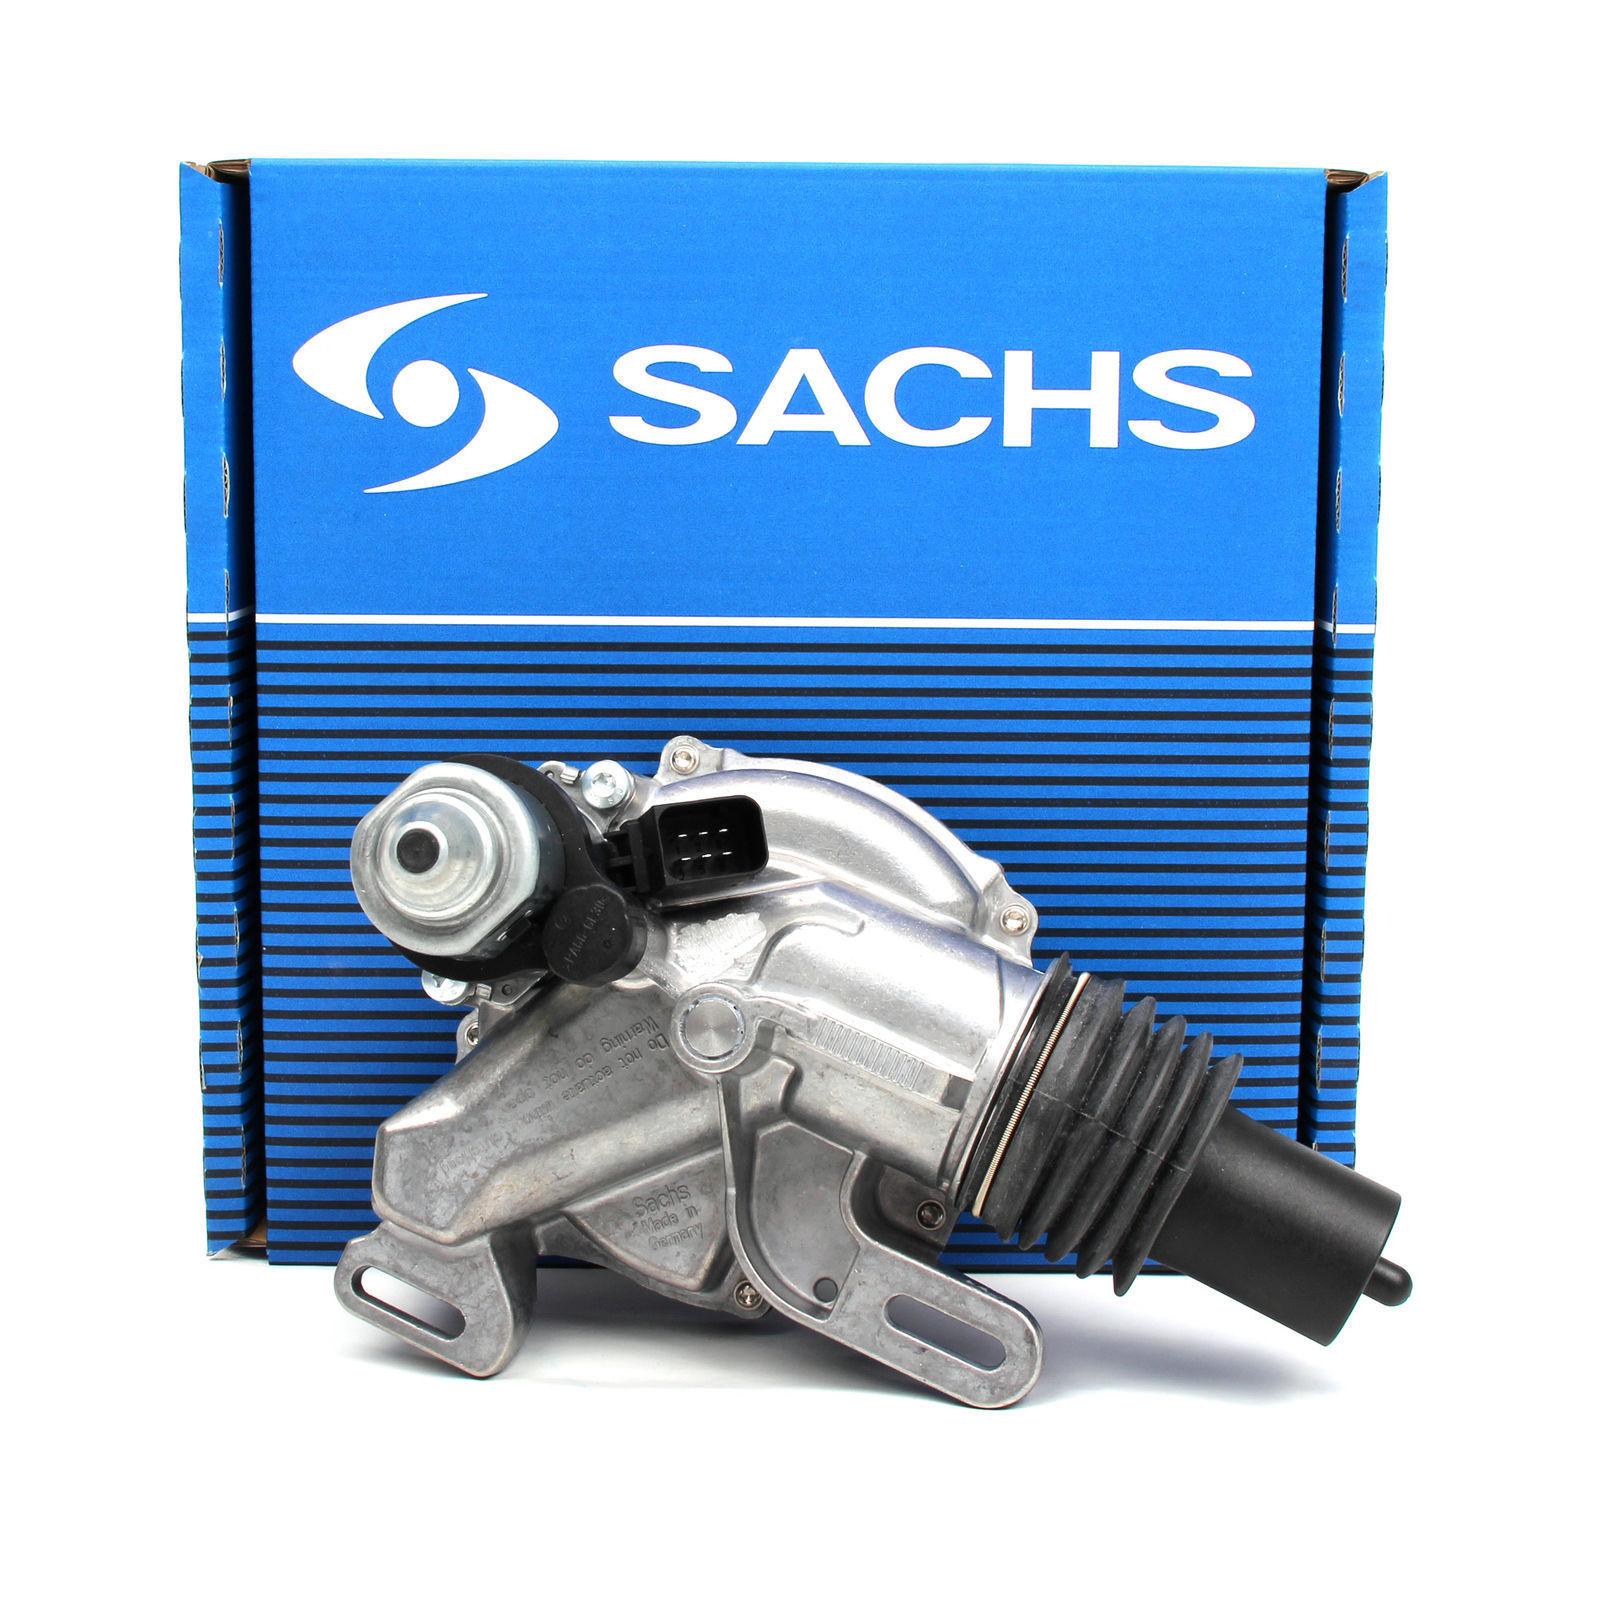 451 1.0 benzina Coupé 0.8 CDi SACHS 3981000066 ATTUATORE FRIZIONE SMART FORTWO